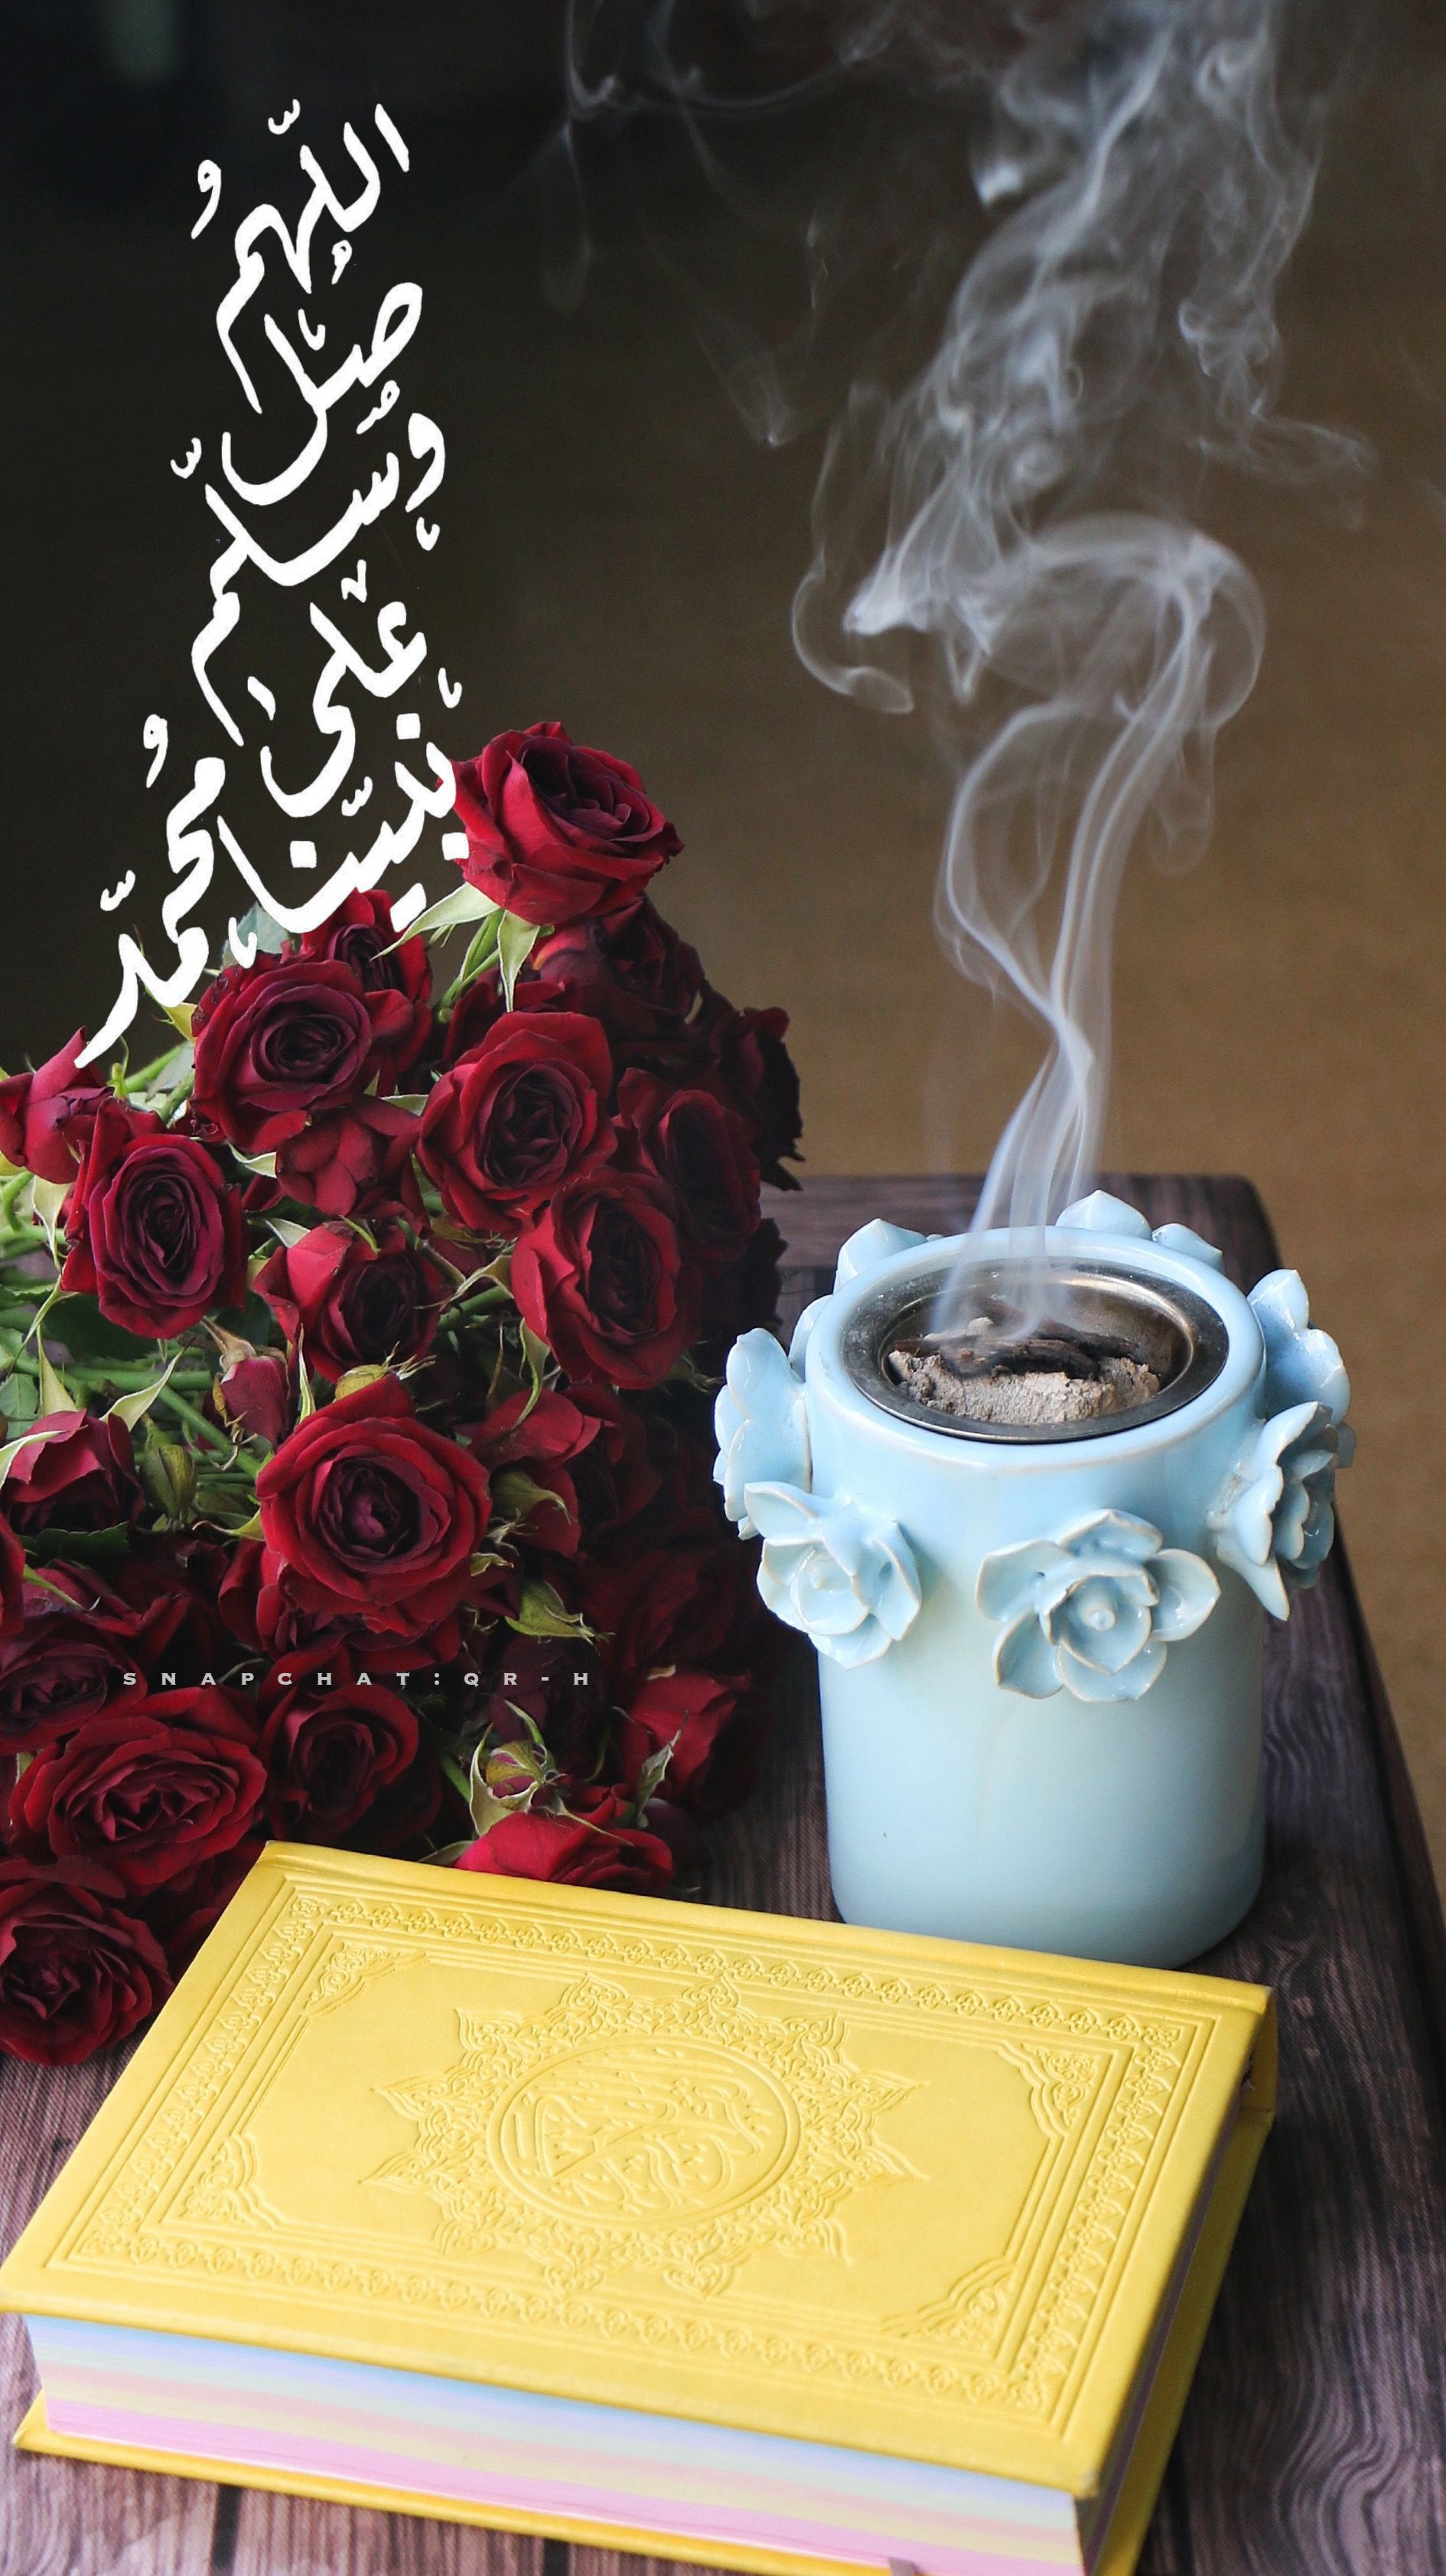 Pin By المحضوض On يومياتي Islamic Quotes Wallpaper Quran Wallpaper Islamic Wallpaper